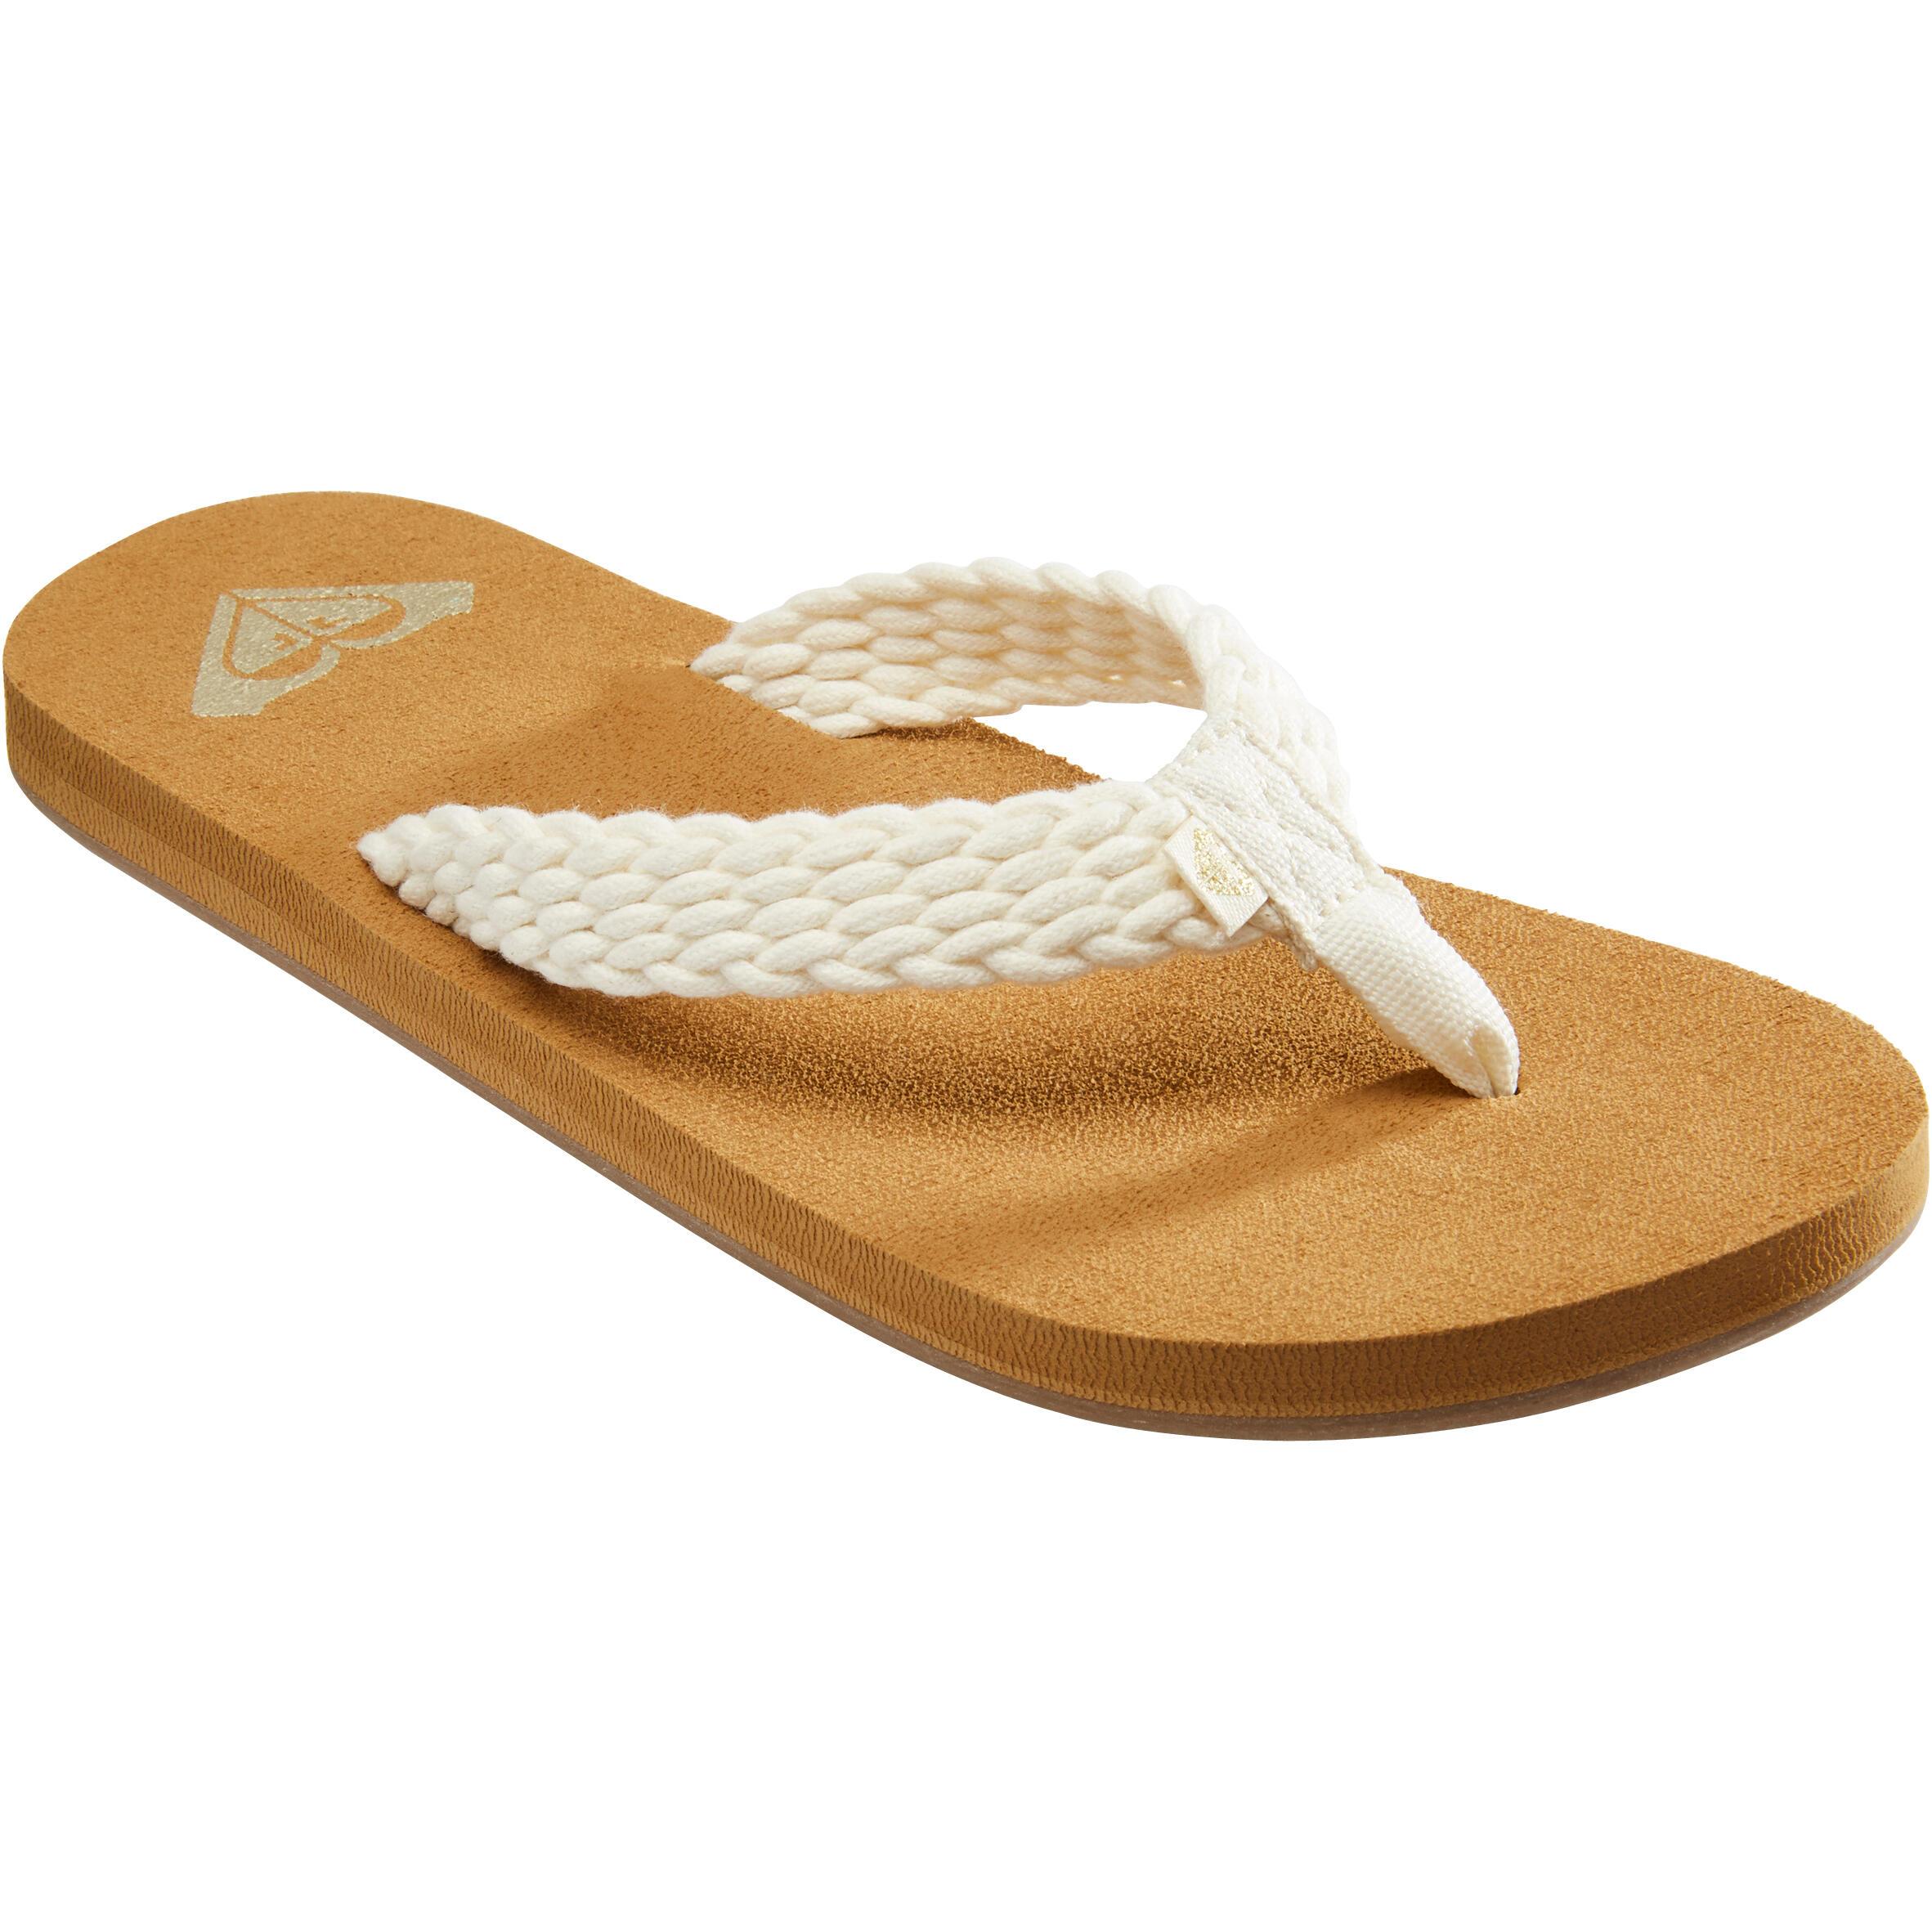 b9712b1a Comprar Chanclas y Sandalias de Playa para Mujer Online | Decathlon